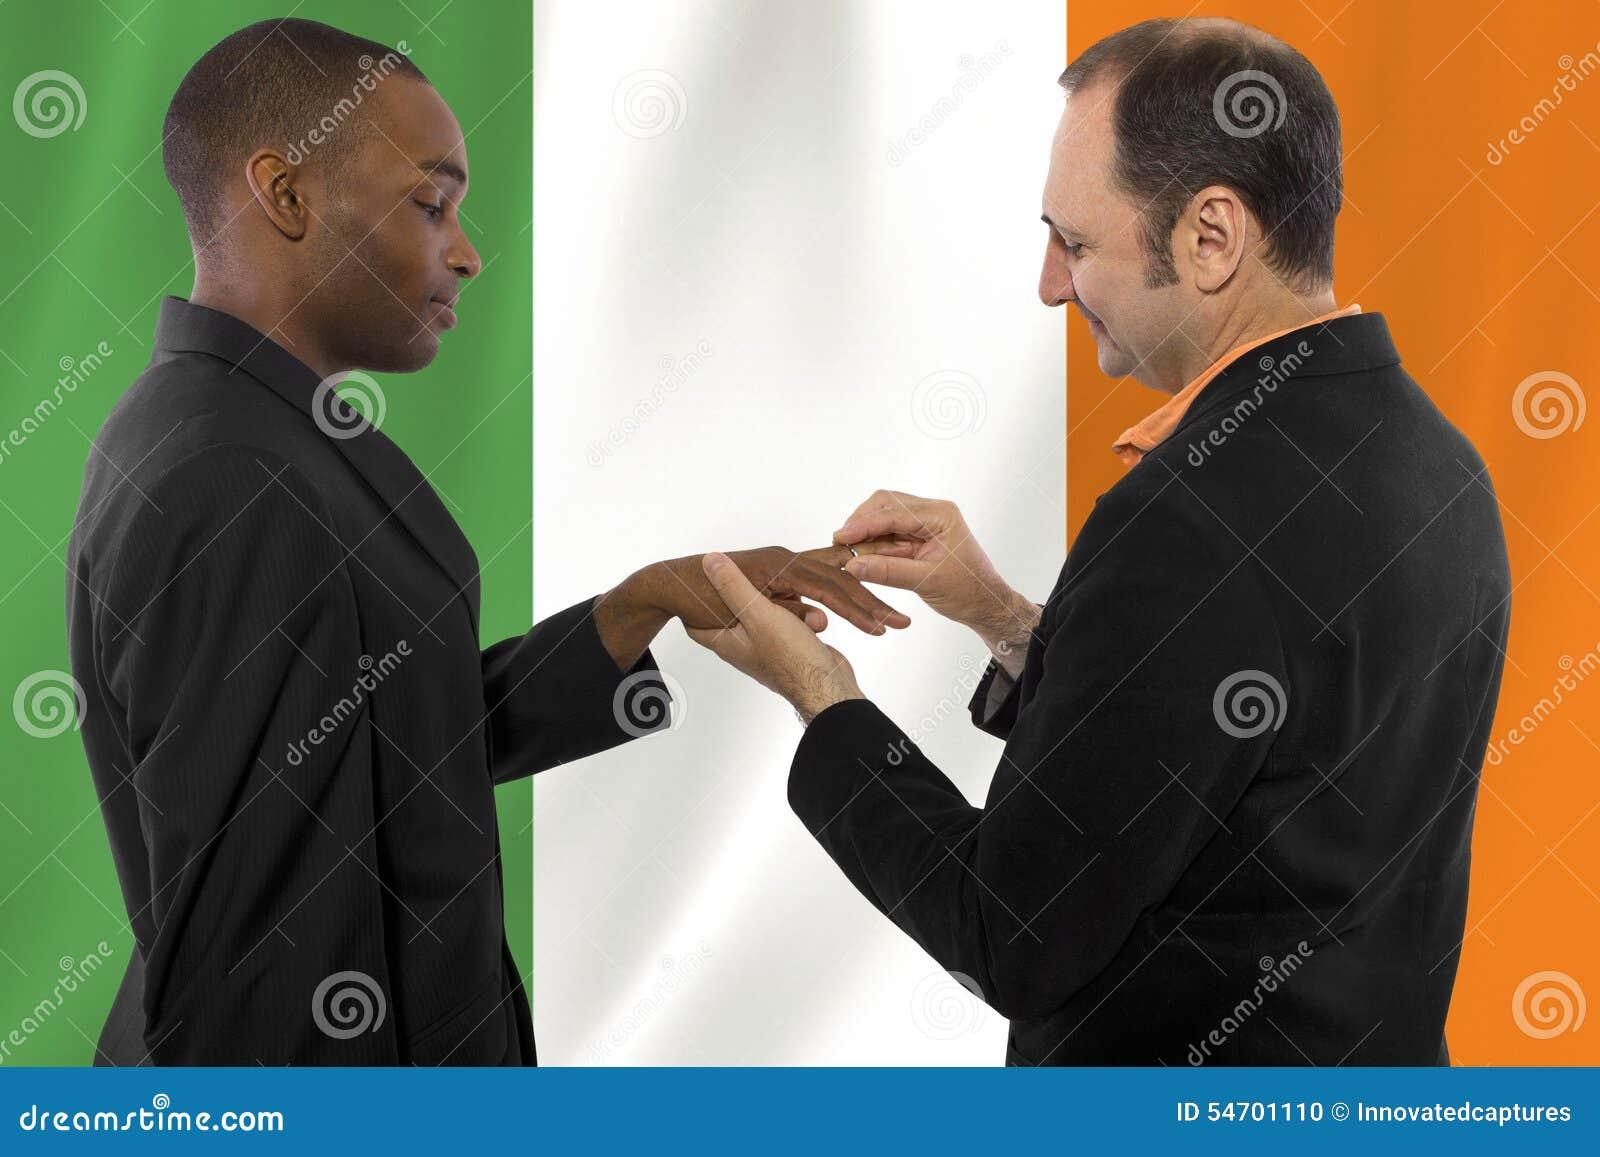 Same Sex Couple in Ireland